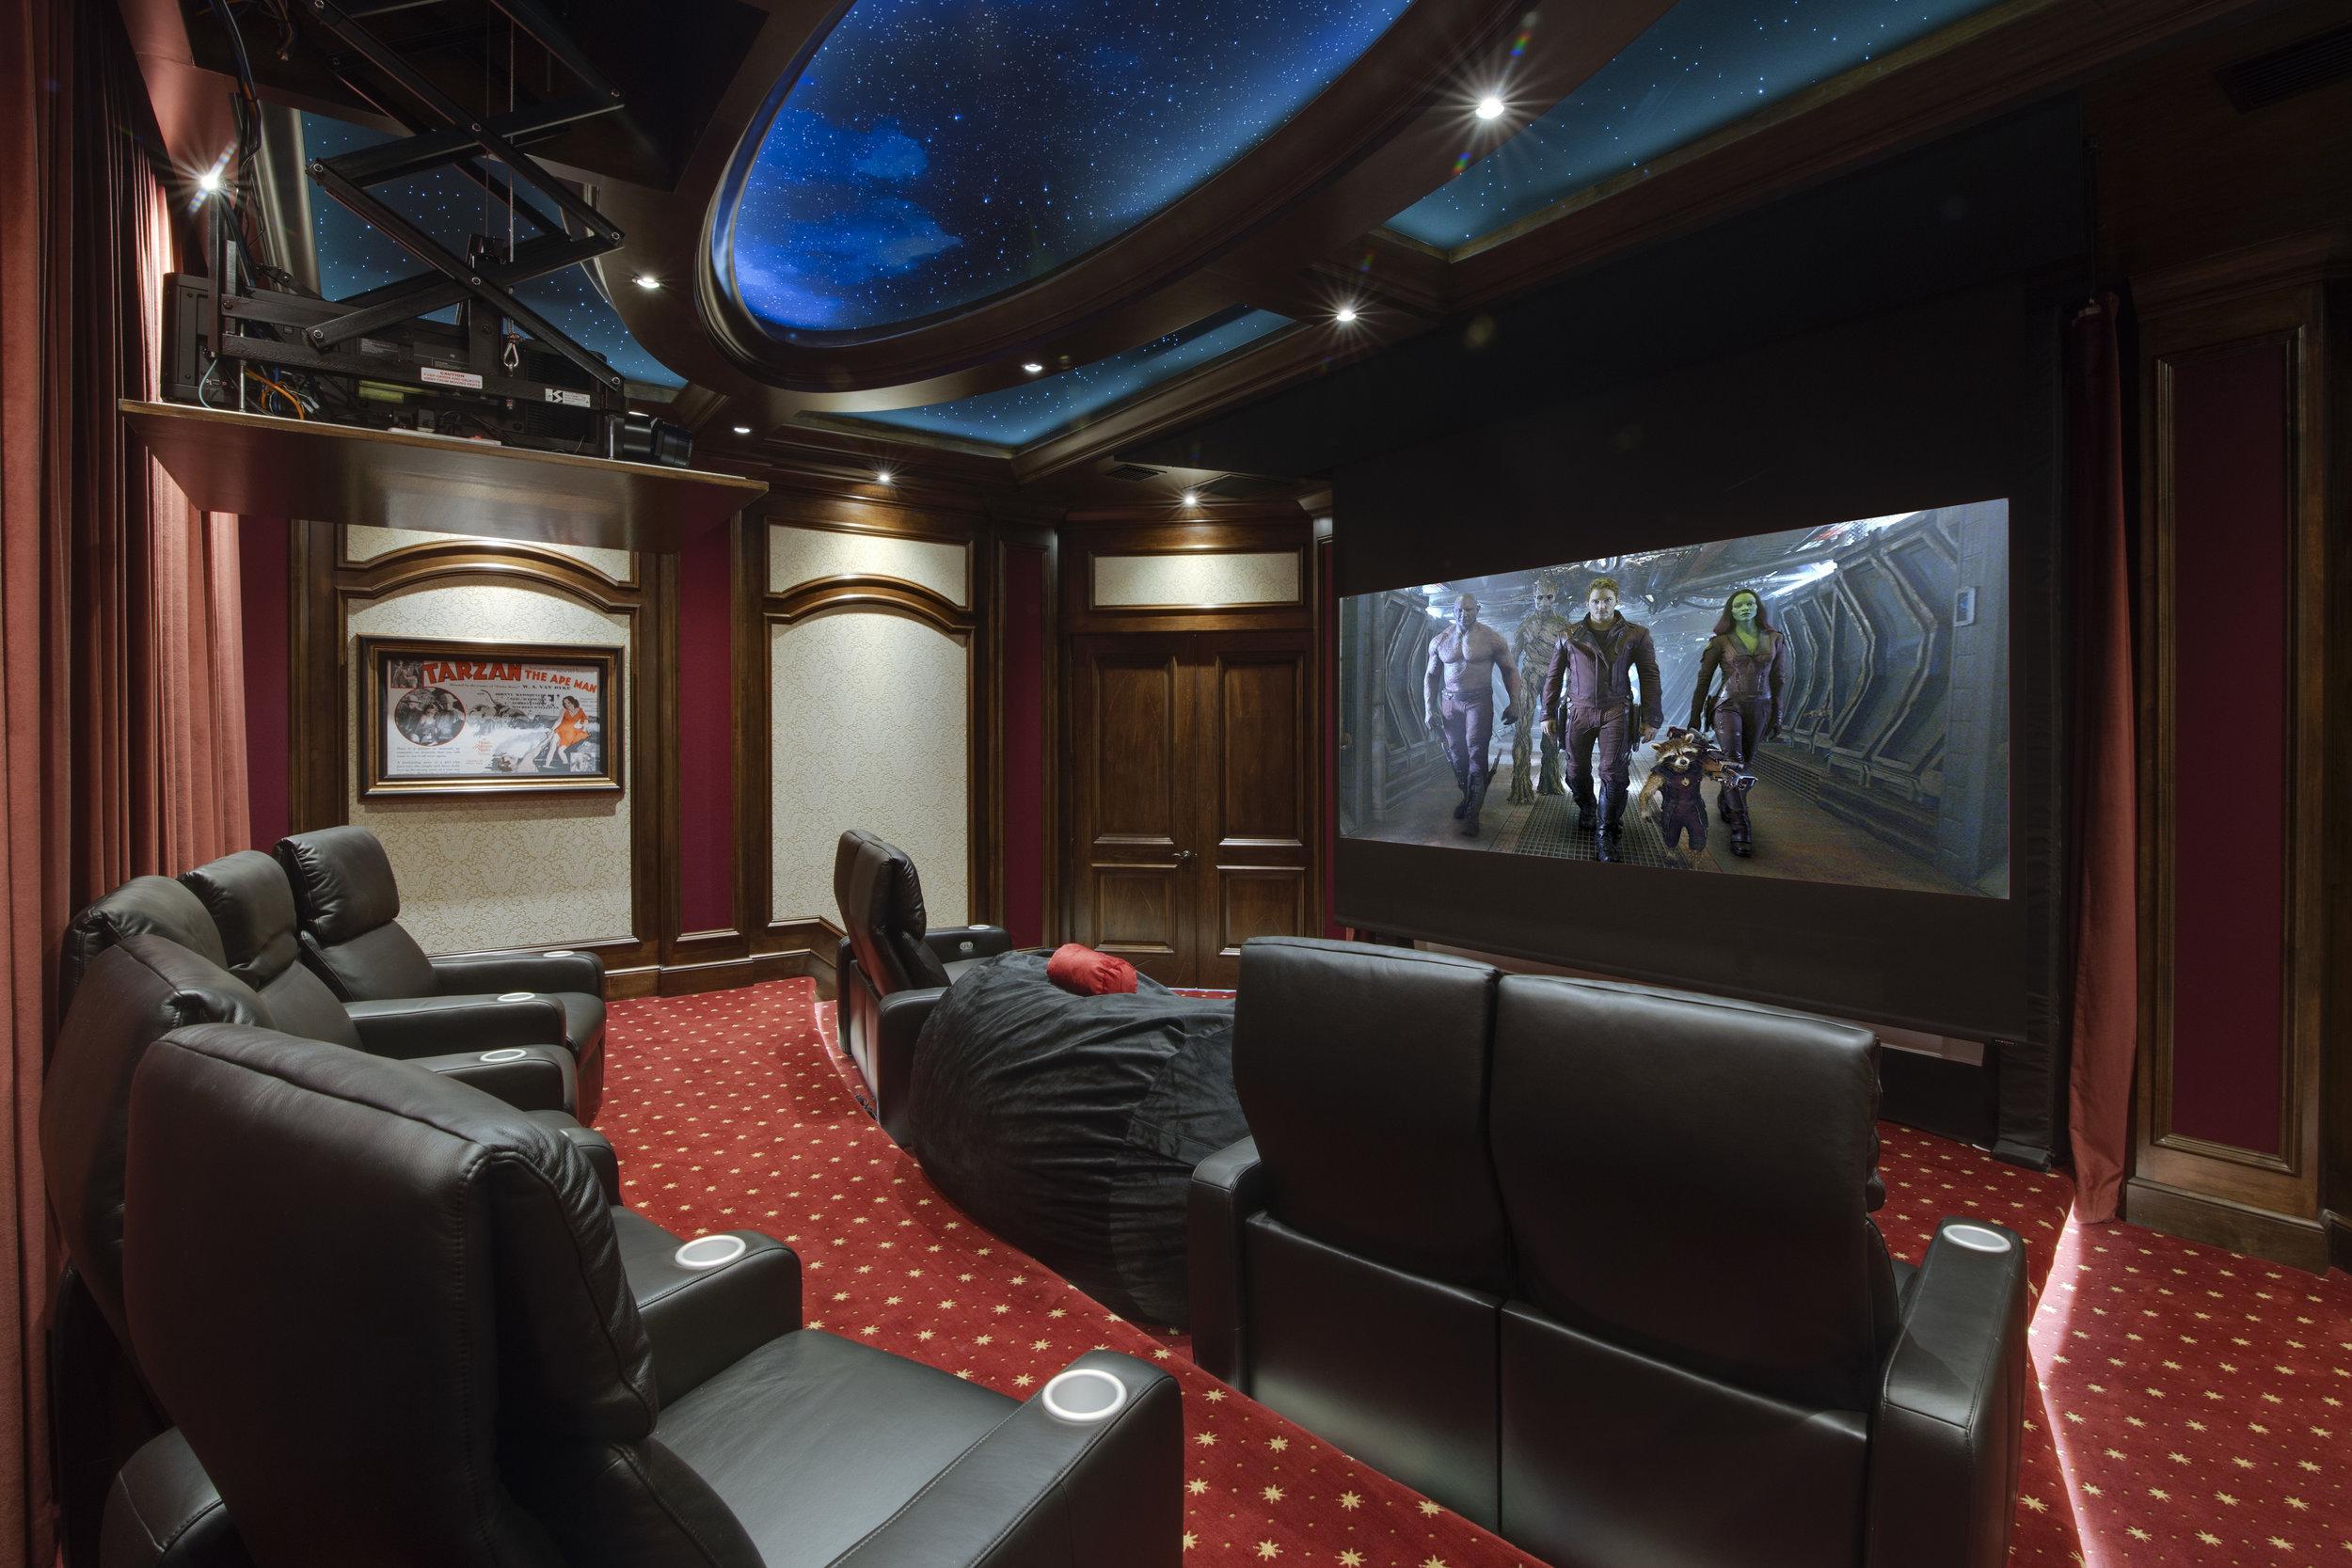 home theater golf simulator totalcare orlando. Black Bedroom Furniture Sets. Home Design Ideas